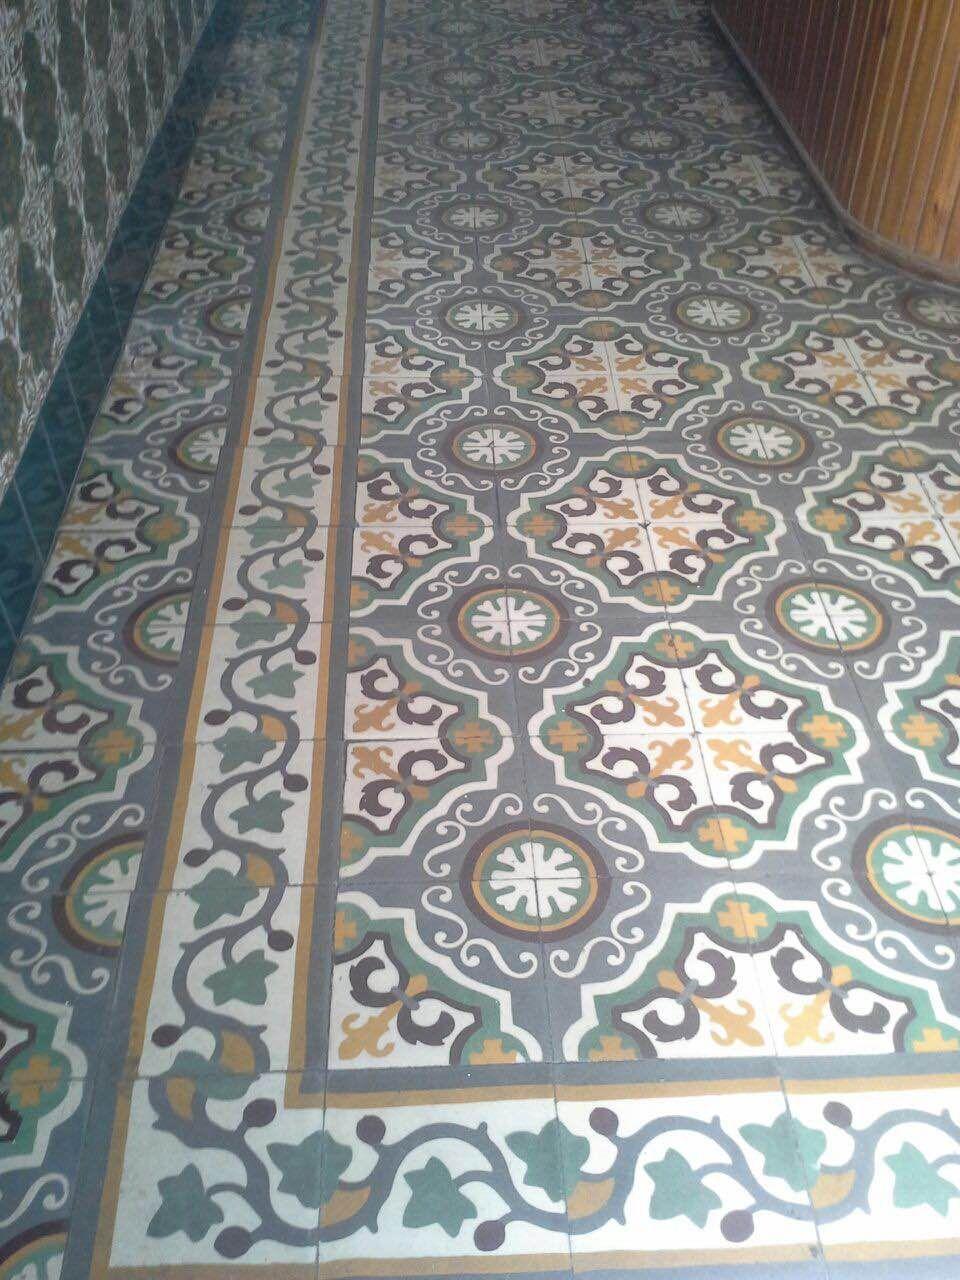 Zementfliesen, Marokko. Cement Tiles, #Morocco | Tiles | Pinterest